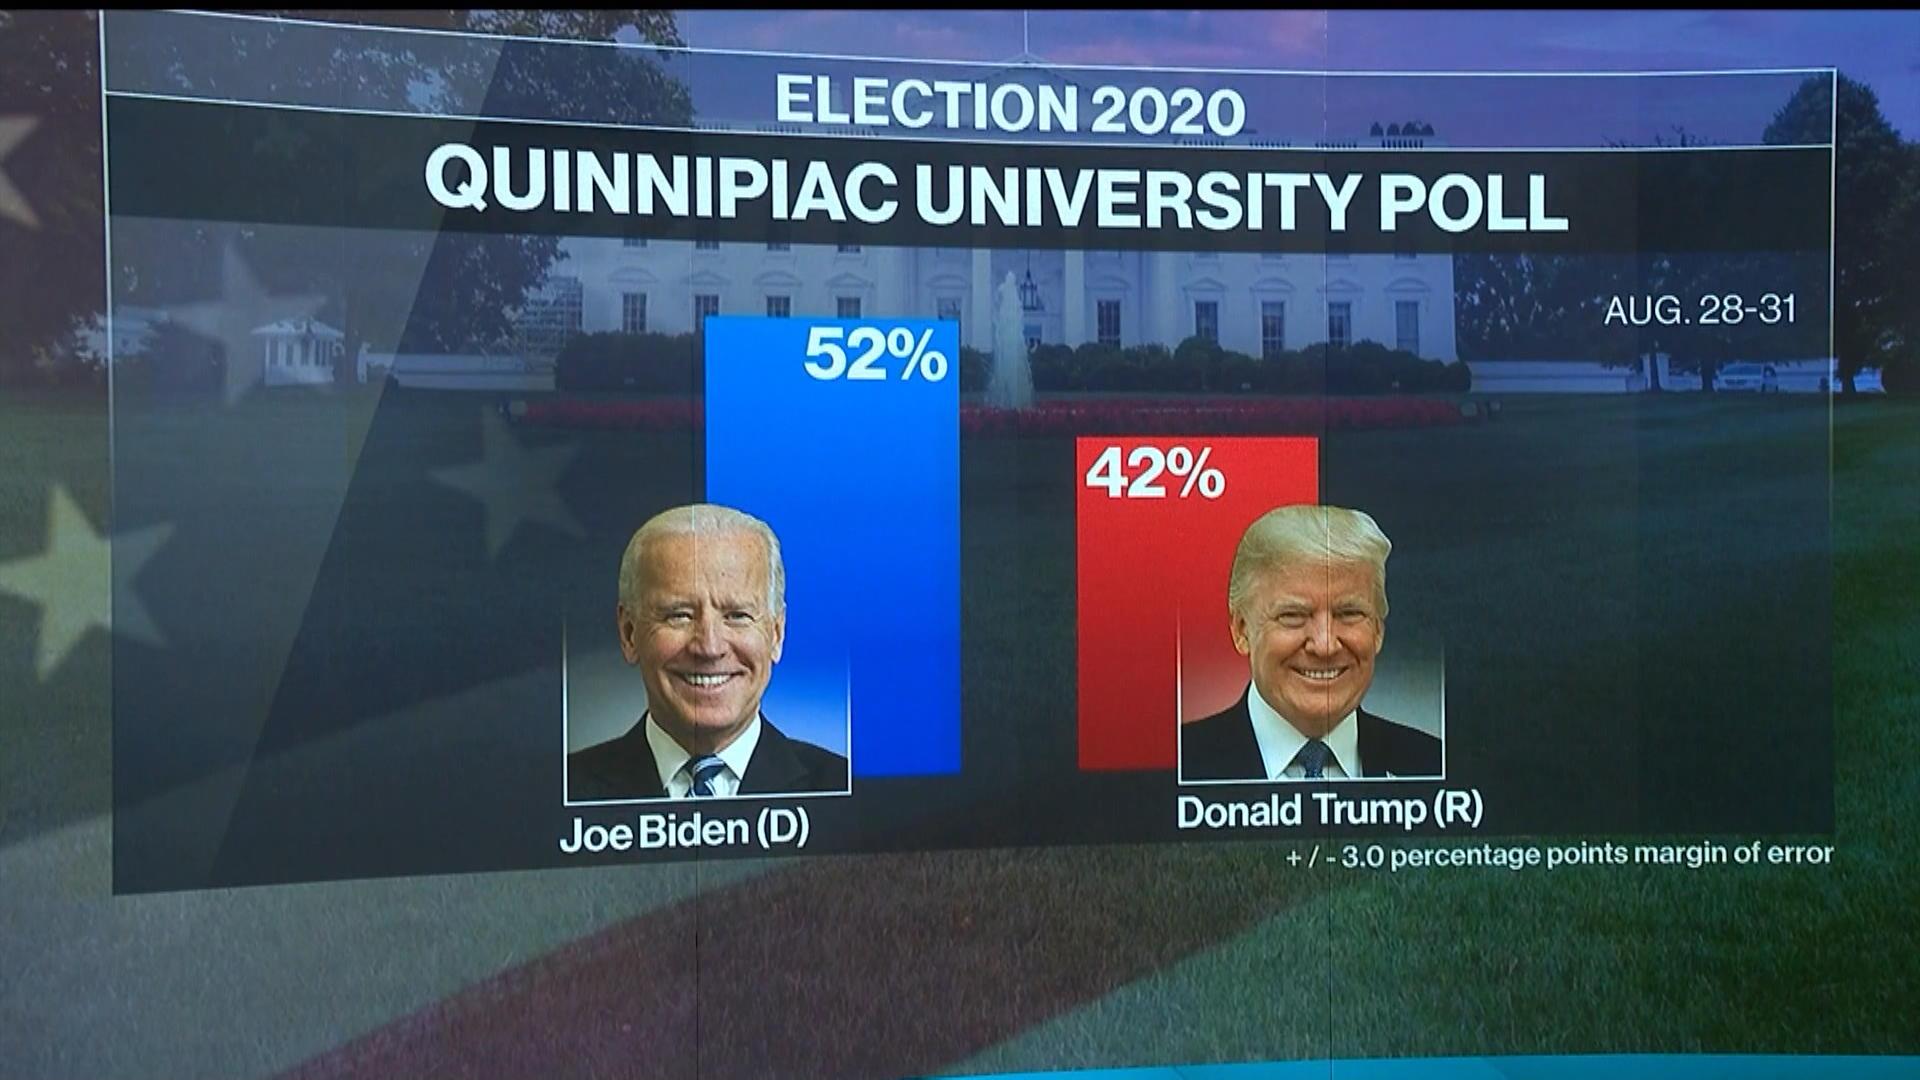 Trump vs. Biden: Making Sense of 2020 Election Polls - Bloomberg